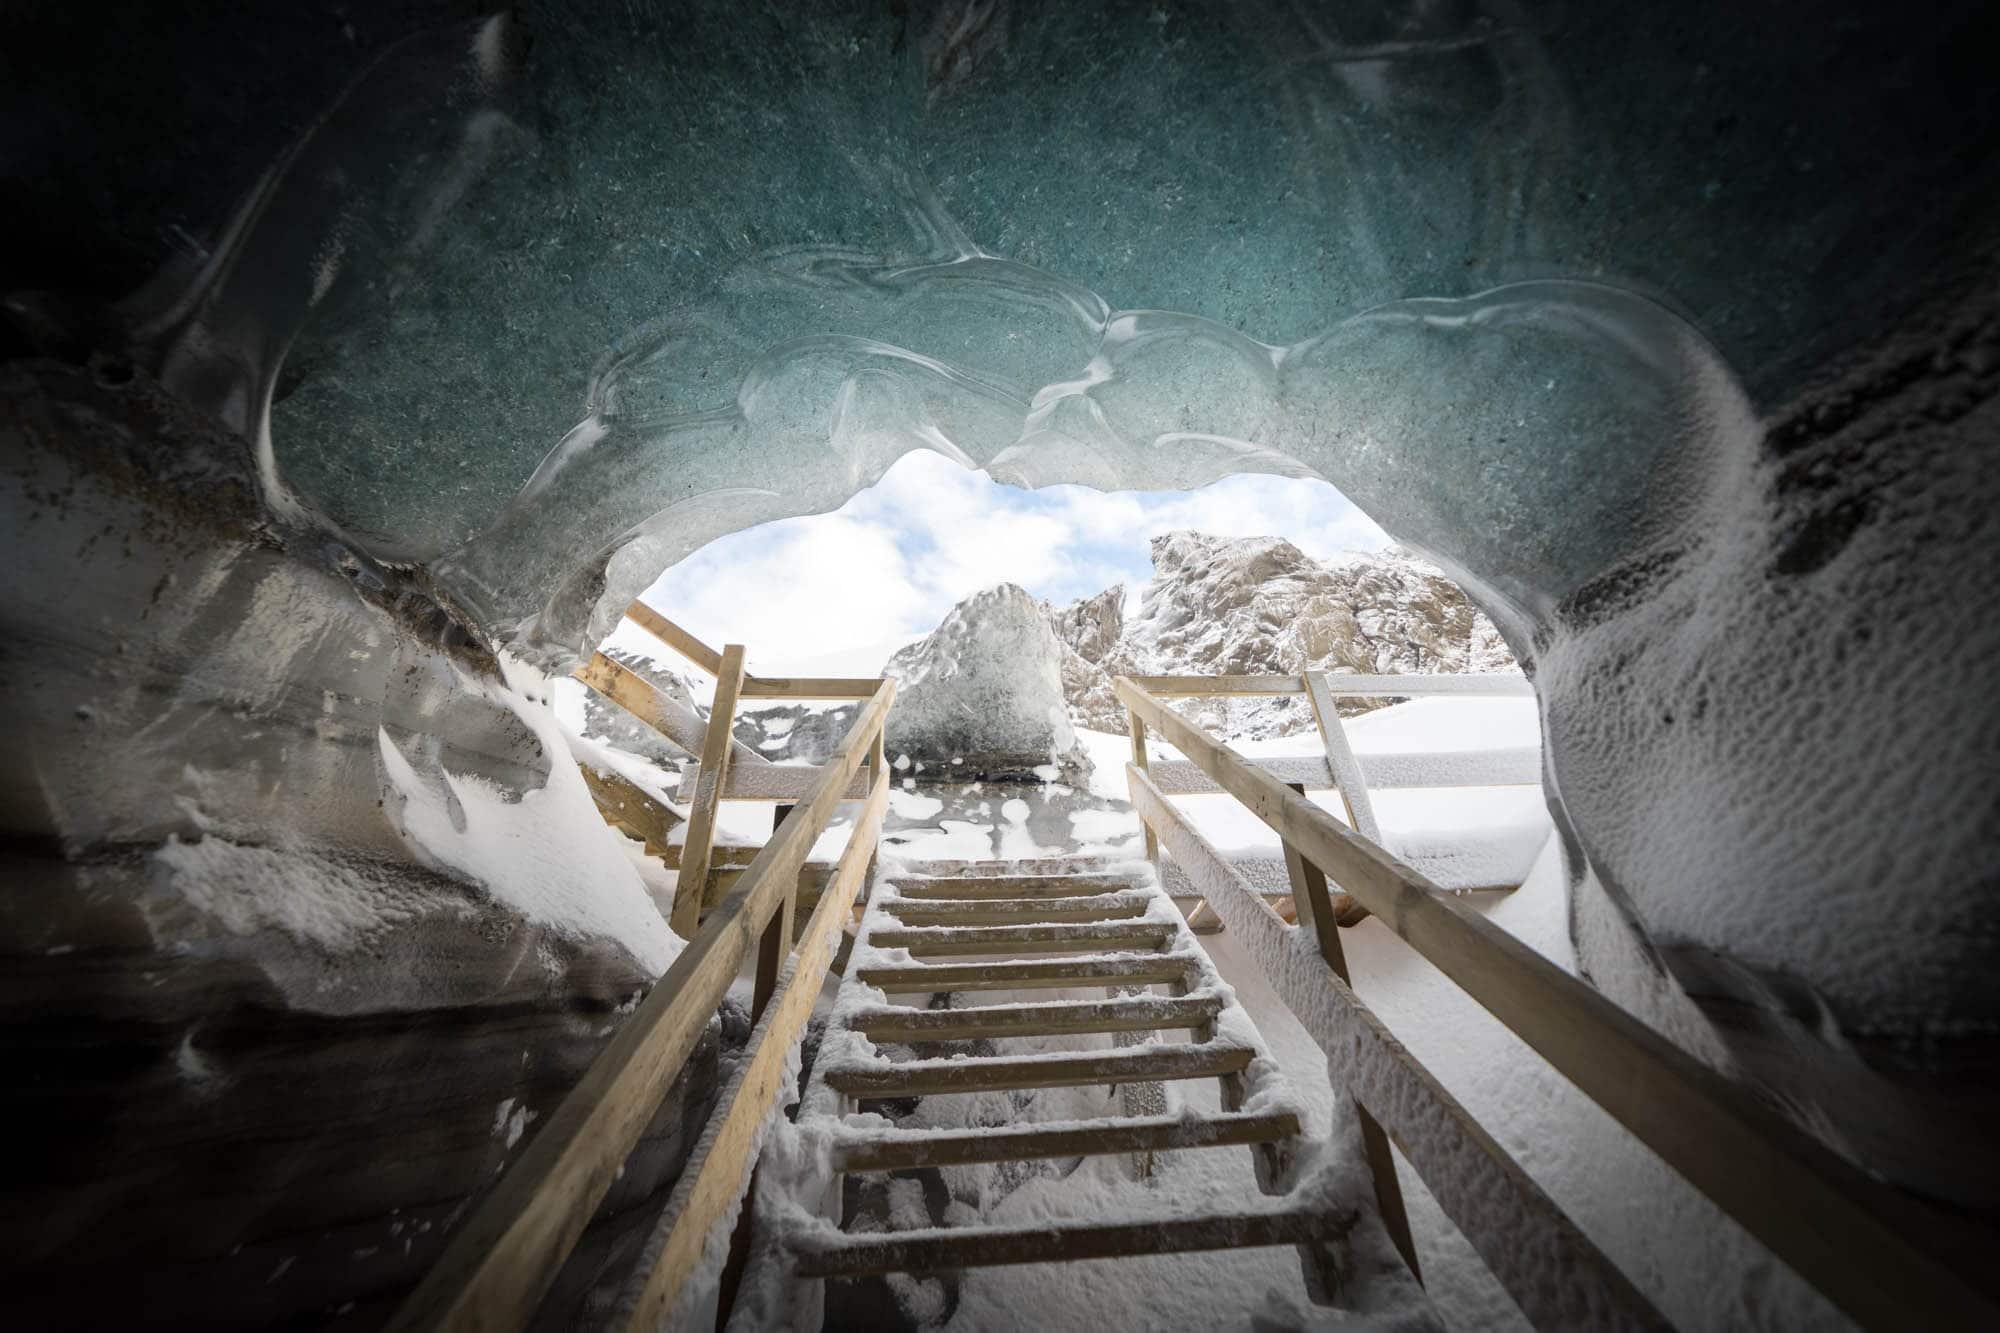 langjokull ice cave - glacier tour from reykjavik